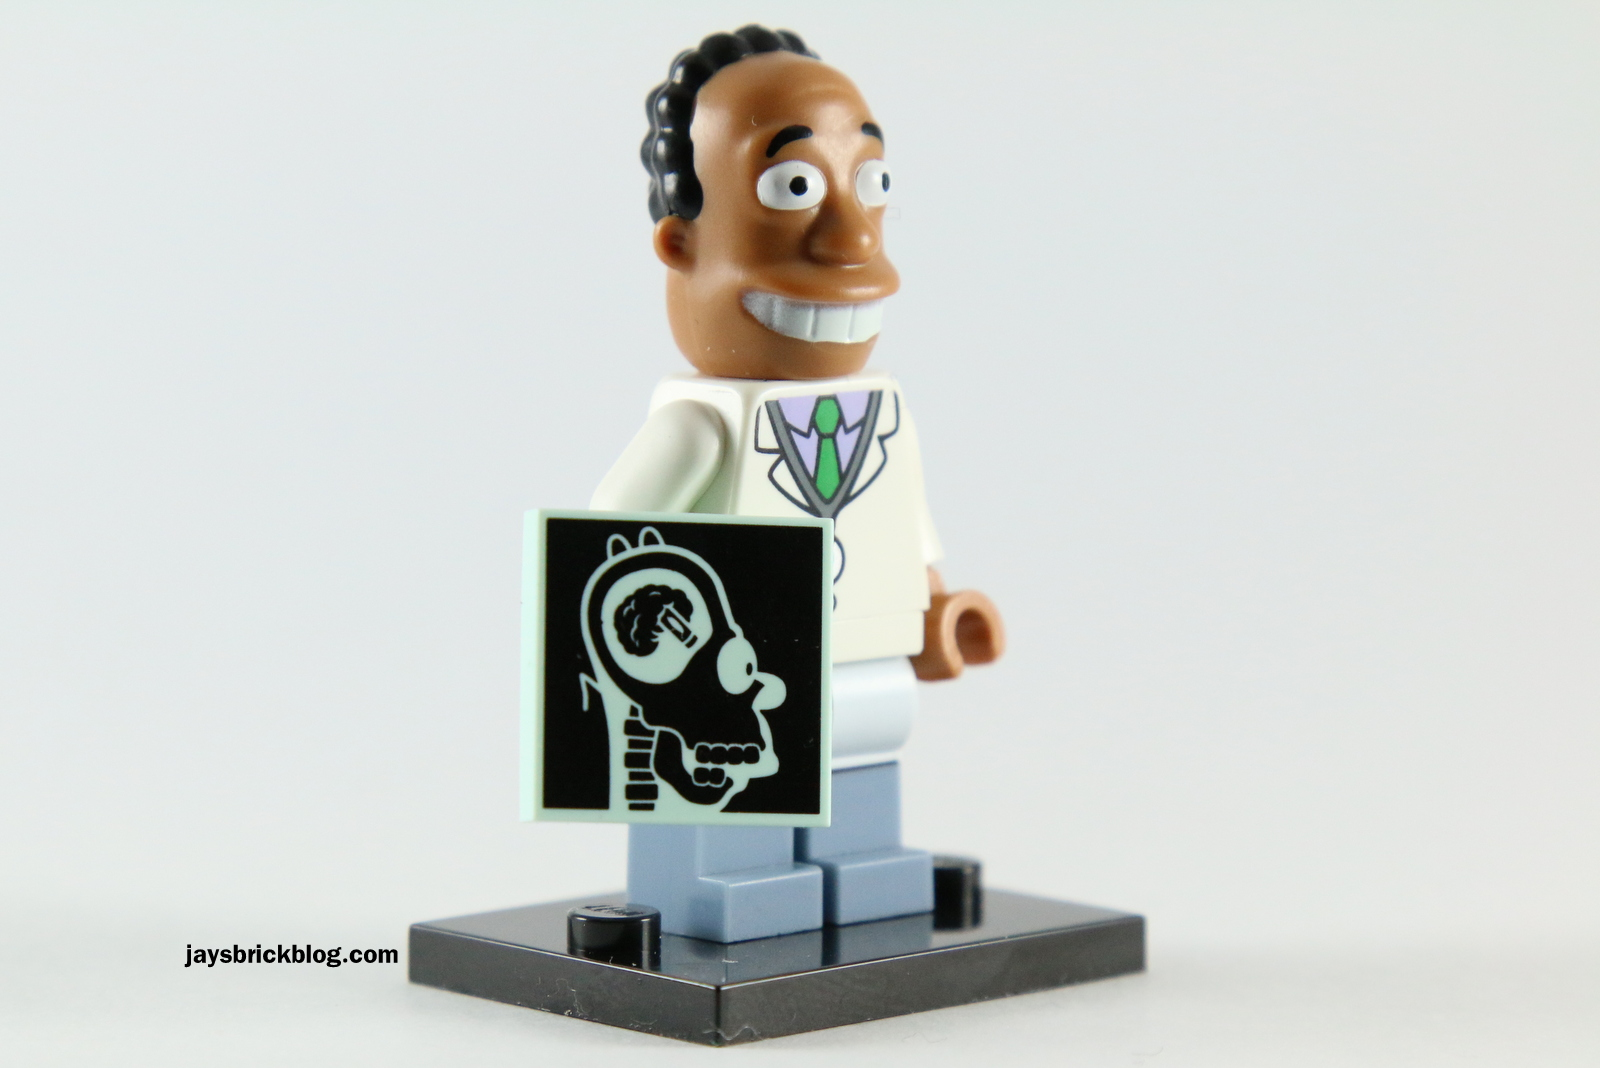 LEGO-MINIFIGURES SERIES 2 SIMPSONS X 1 HEAD FOR JULIUS HIBBERT THE SIMPSONS PART